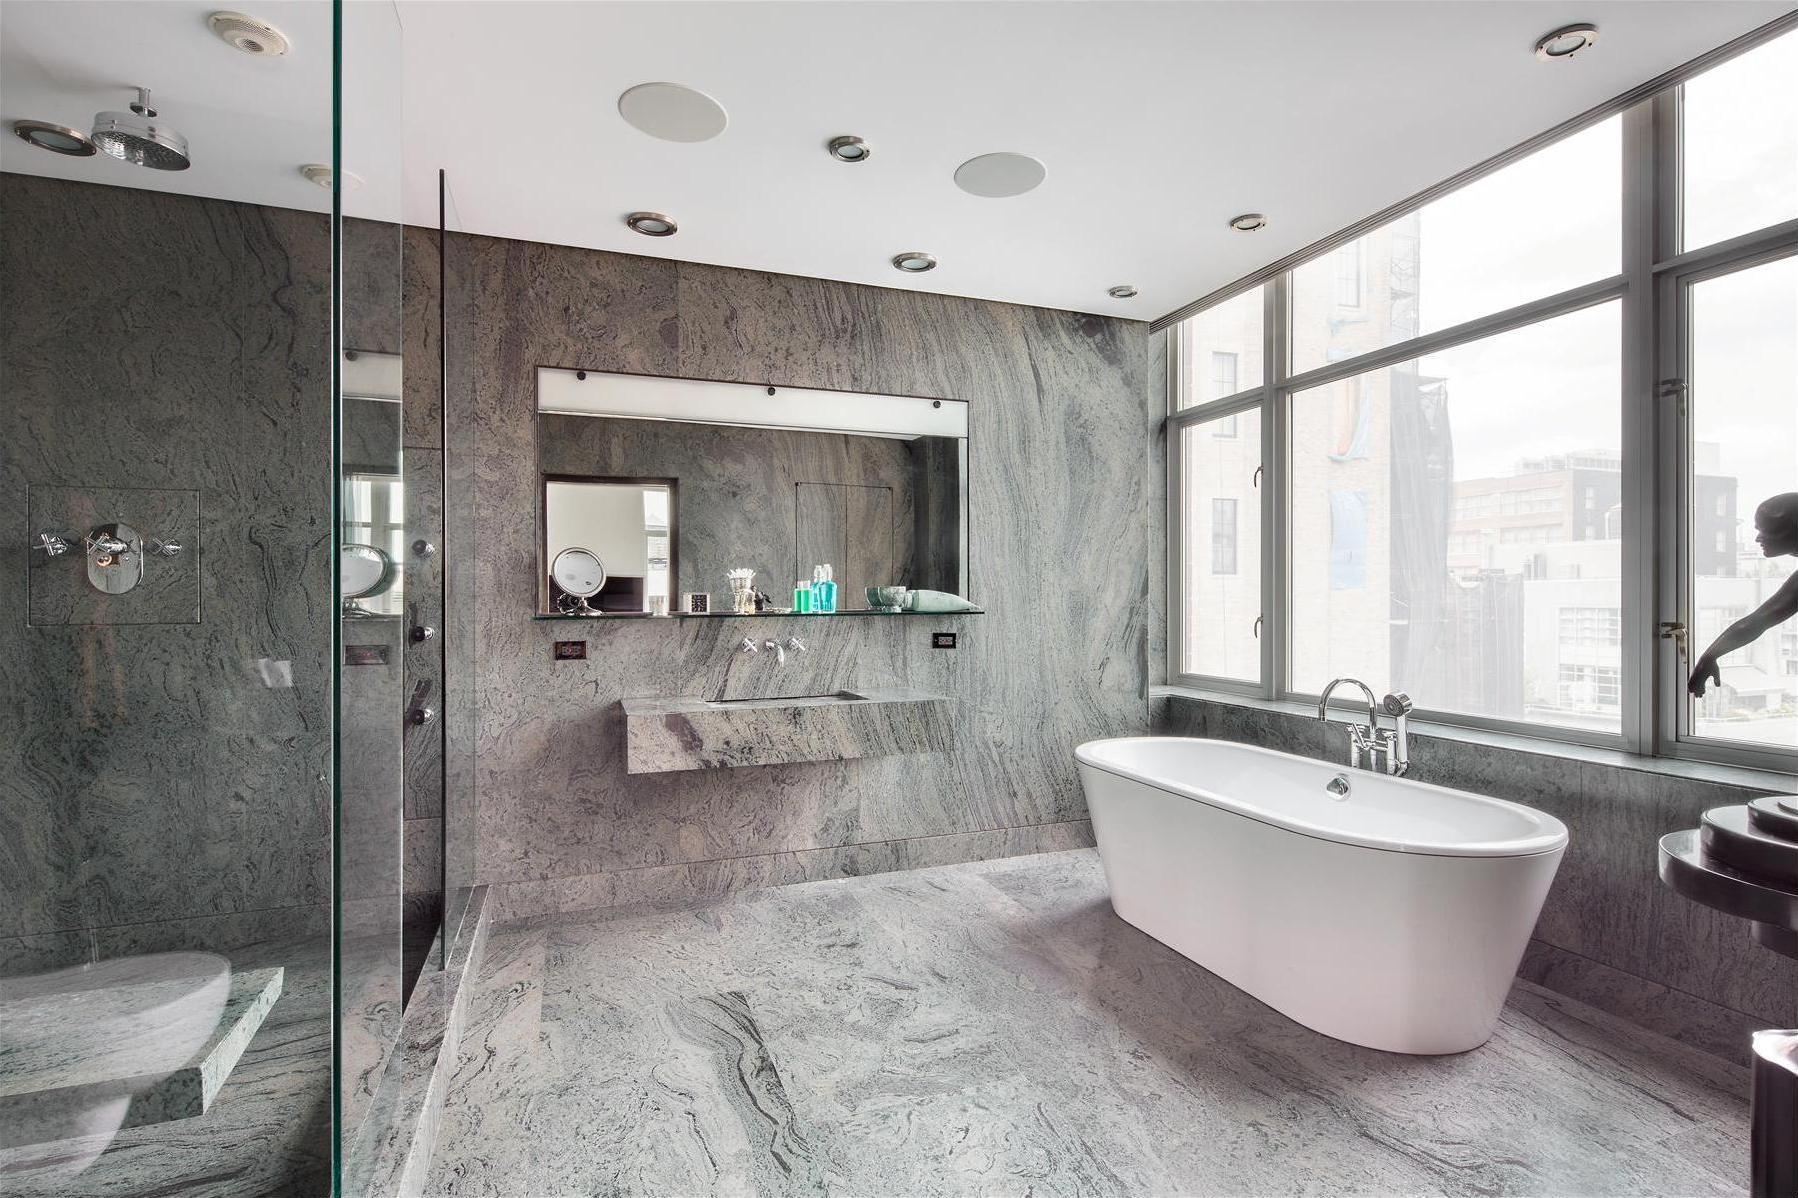 posh bathroom design – jewelery box | homesfeed